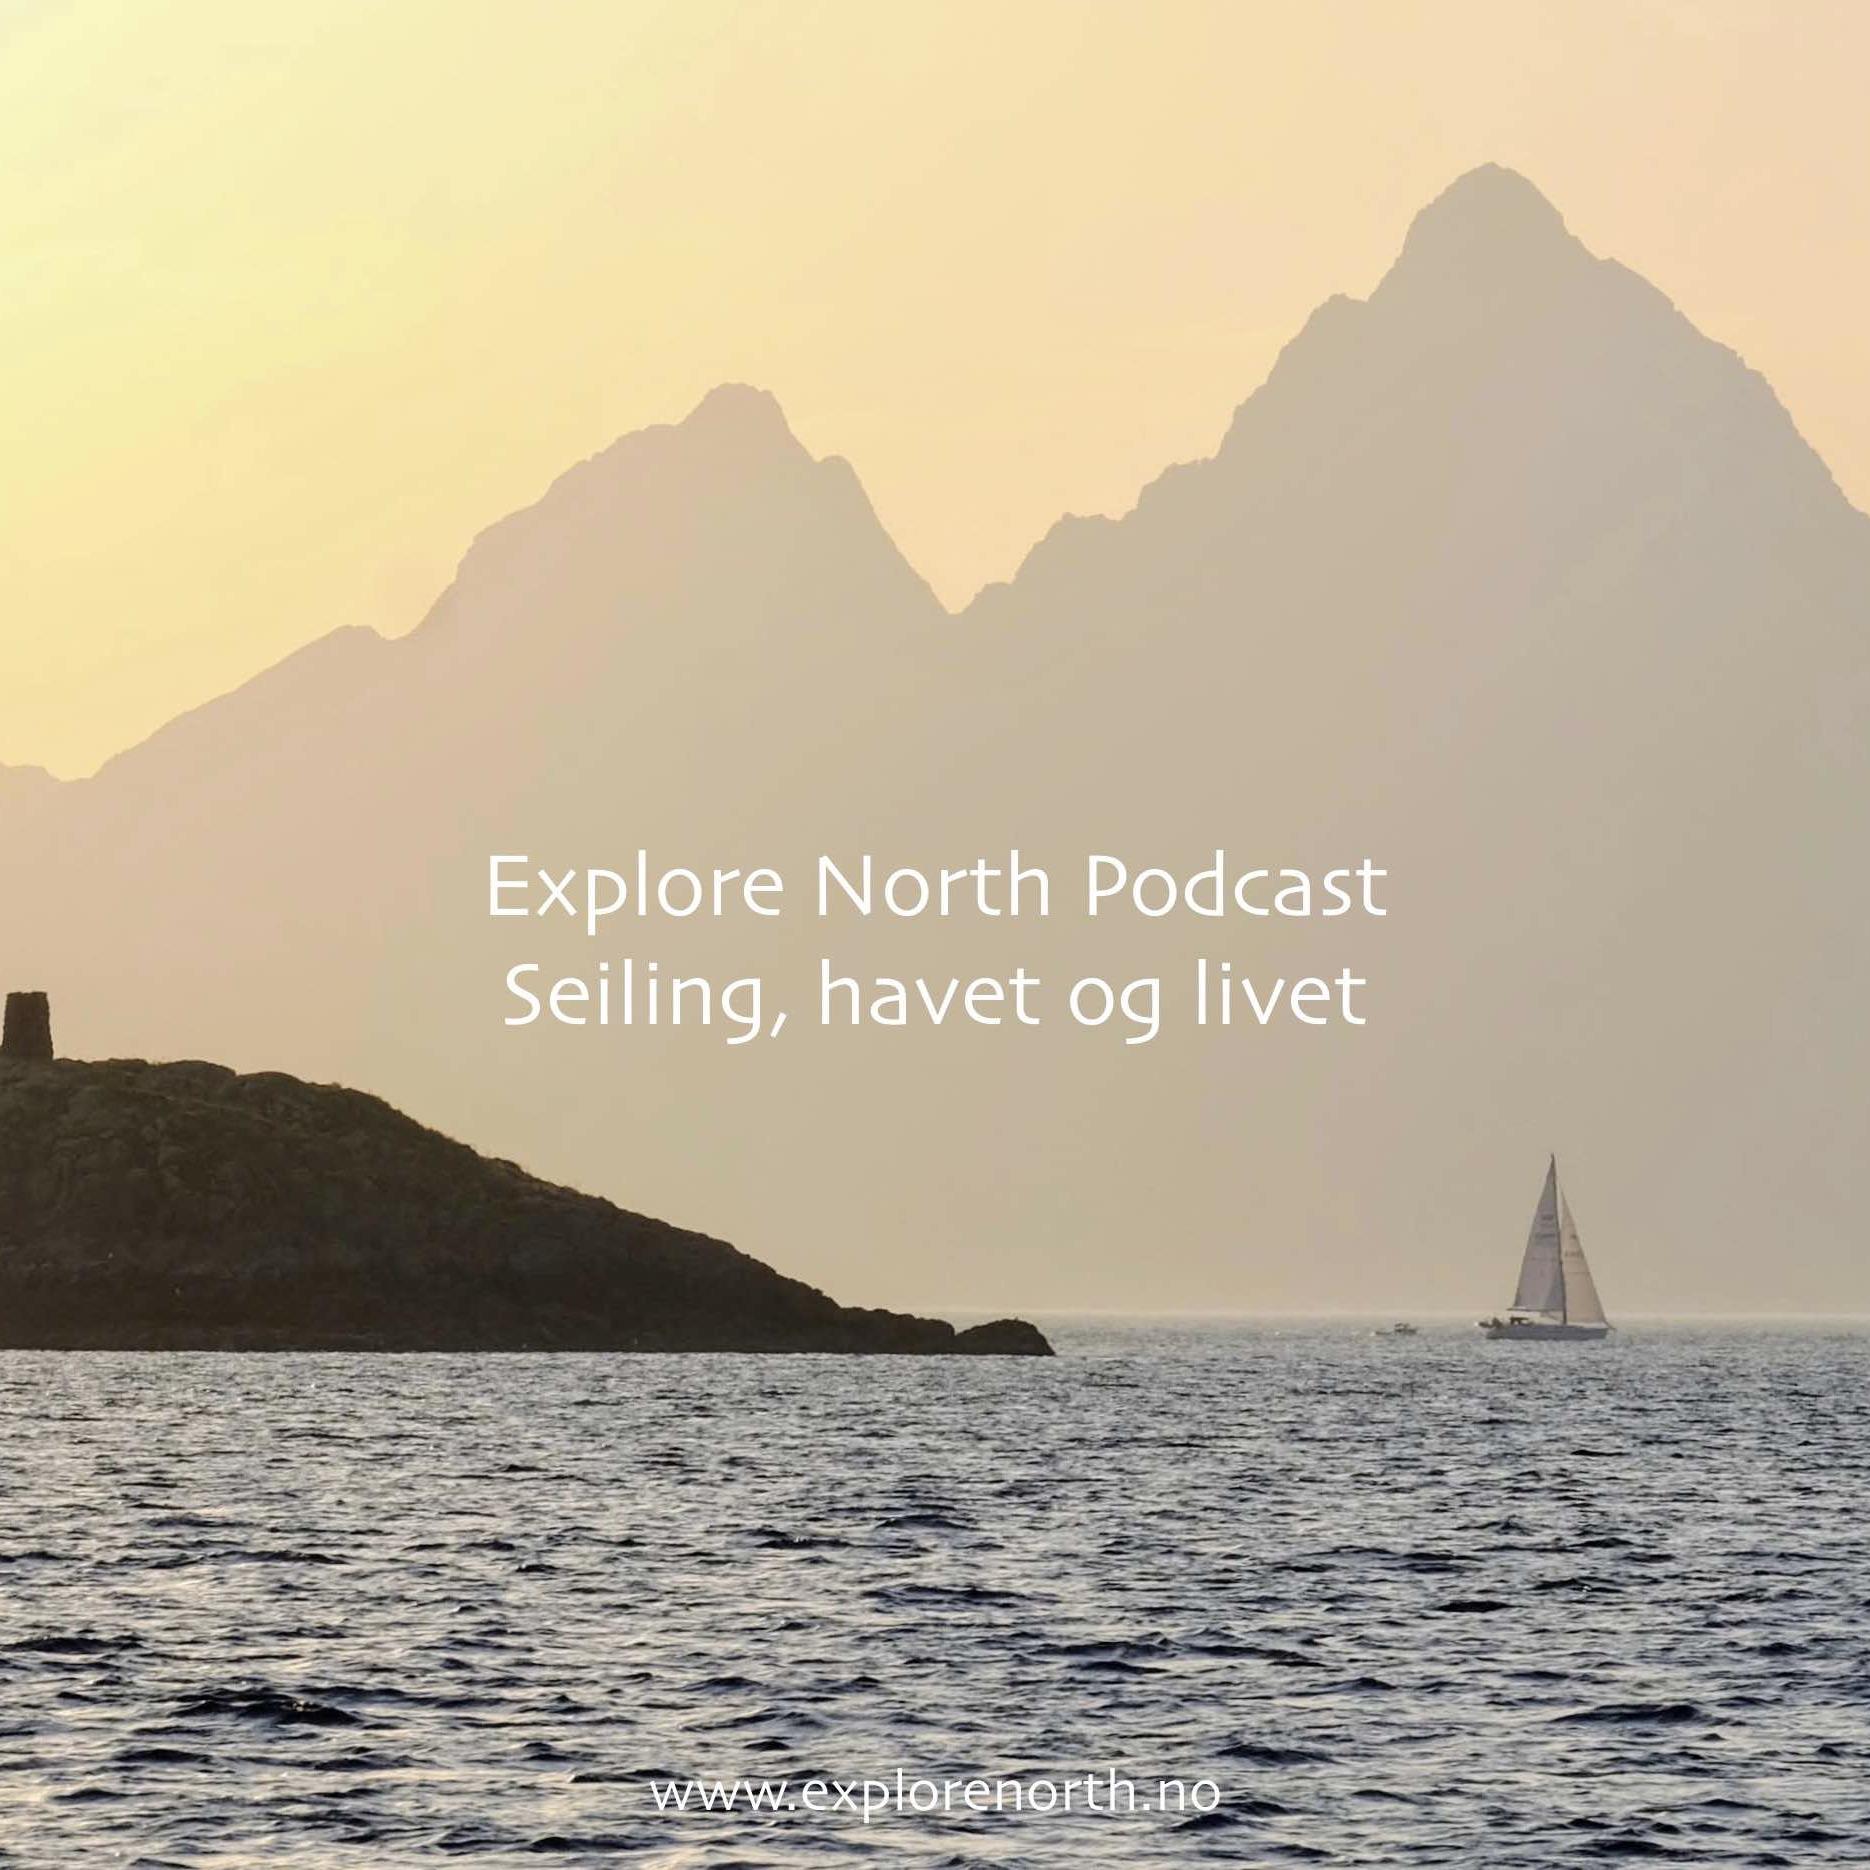 Explore Norths podcast show art